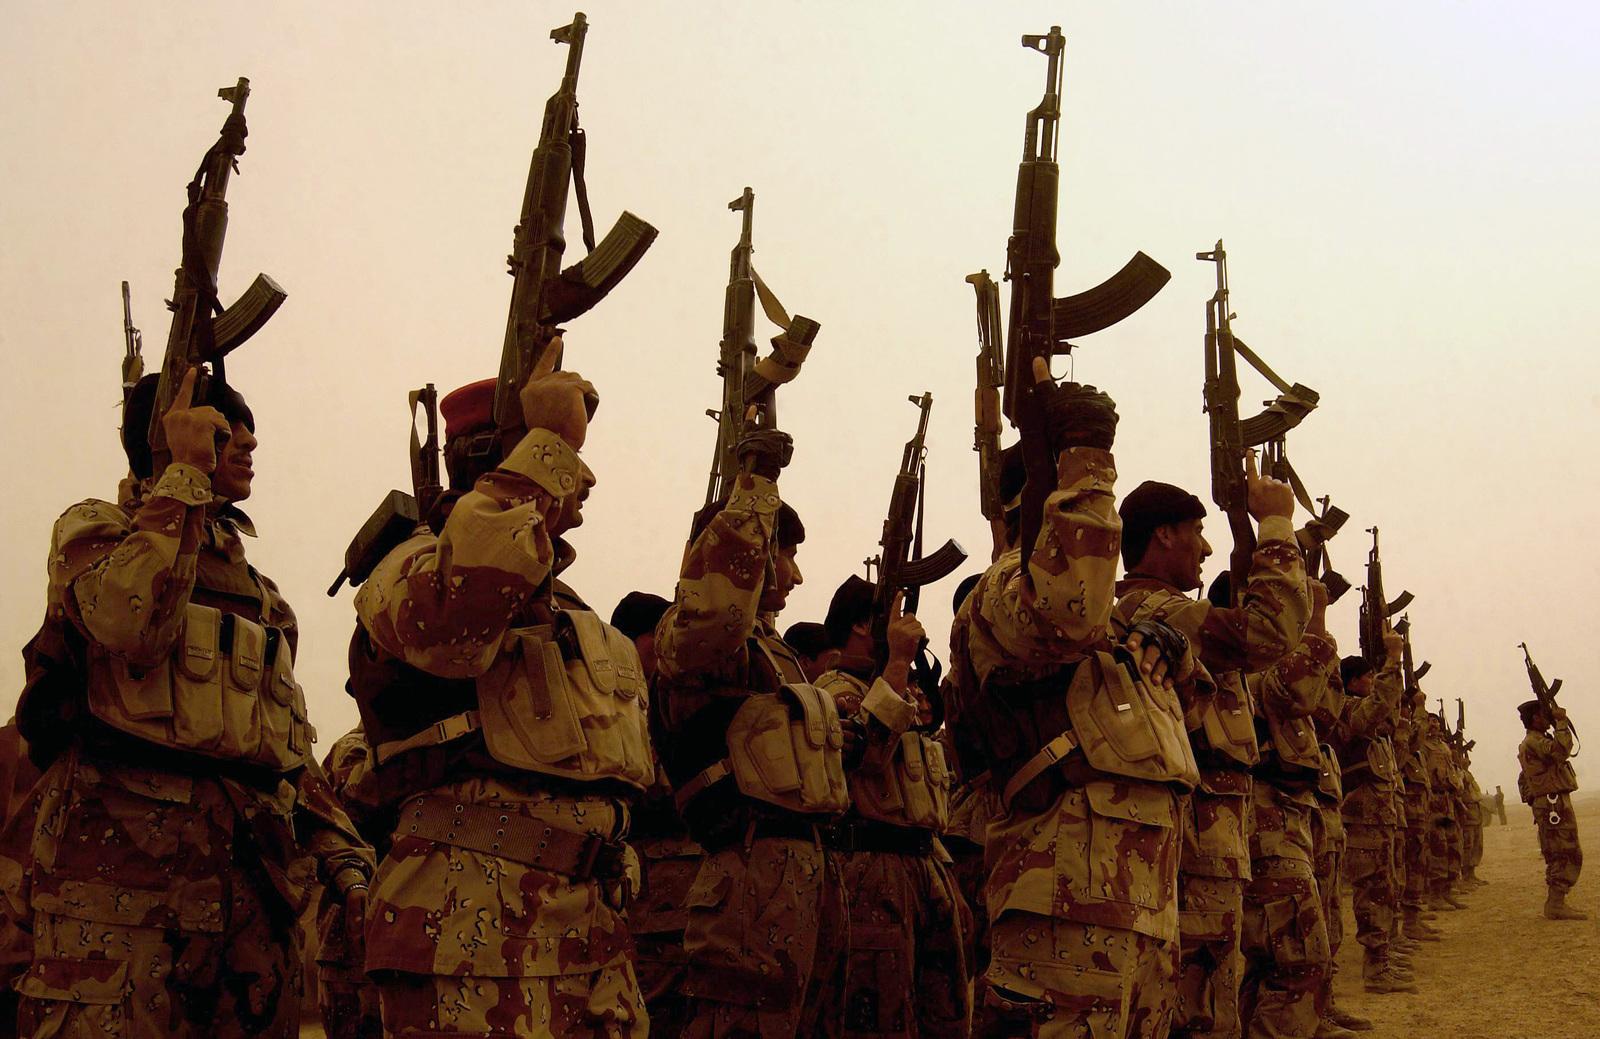 IRAQI FREEDOM II